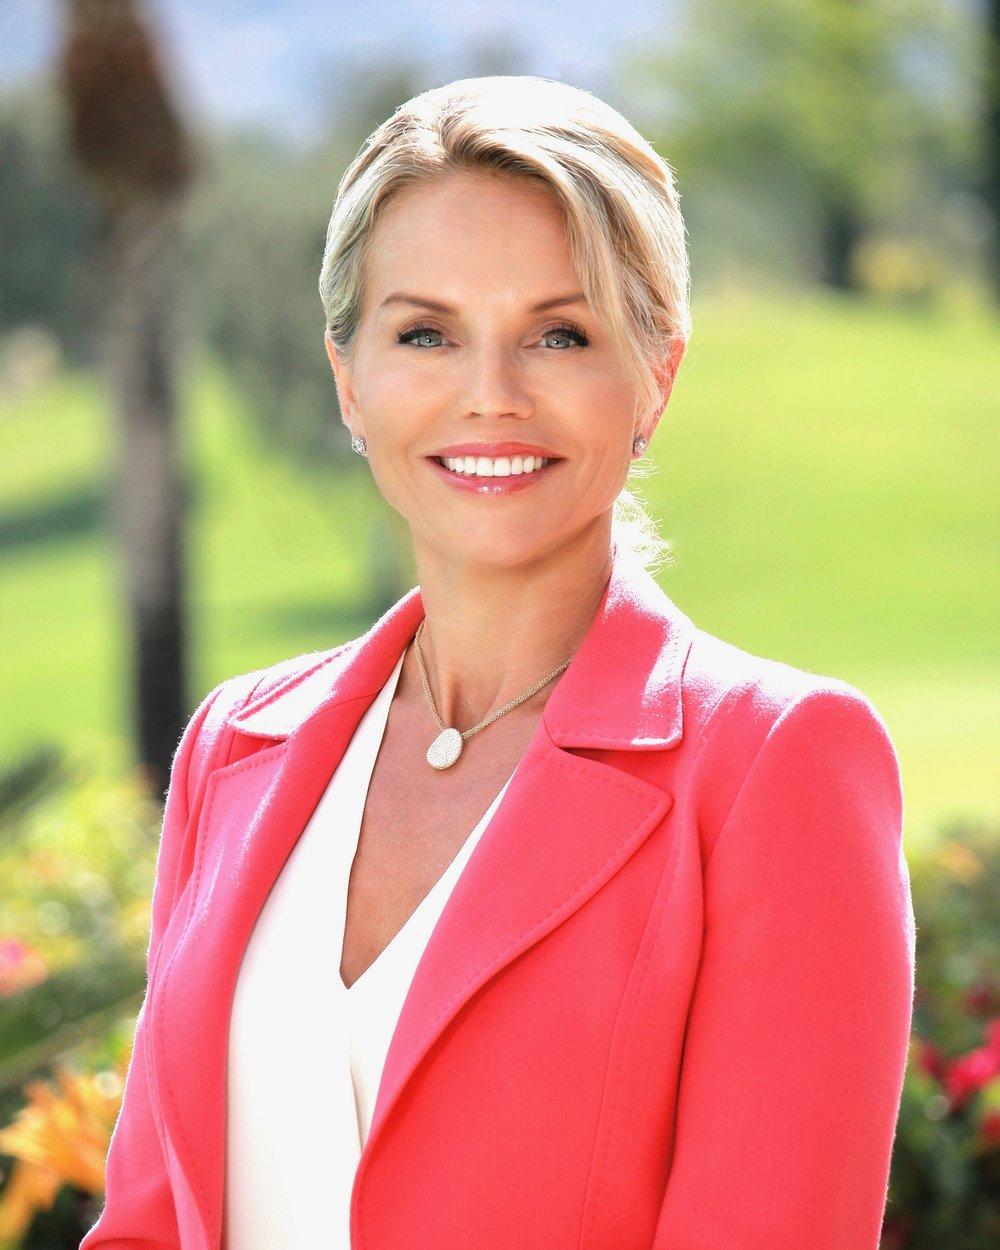 Sherry Schluessel    Entrepreneur, Philanthropist & Kanu Cafe Founder